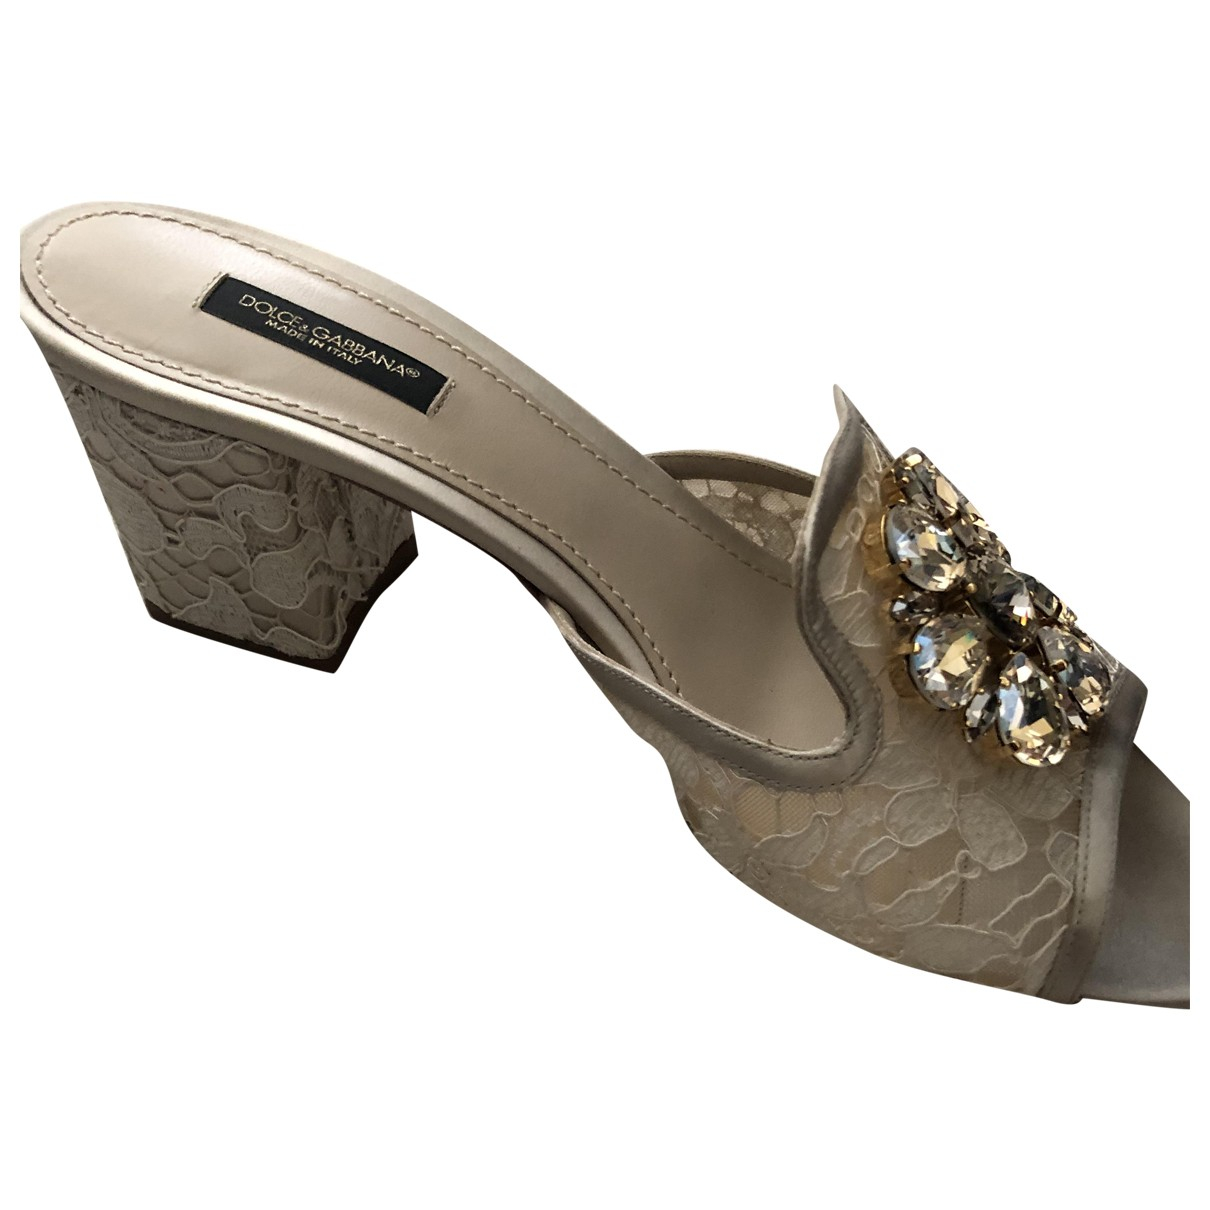 Dolce & Gabbana Taormina Beige Cloth Sandals for Women 39 EU